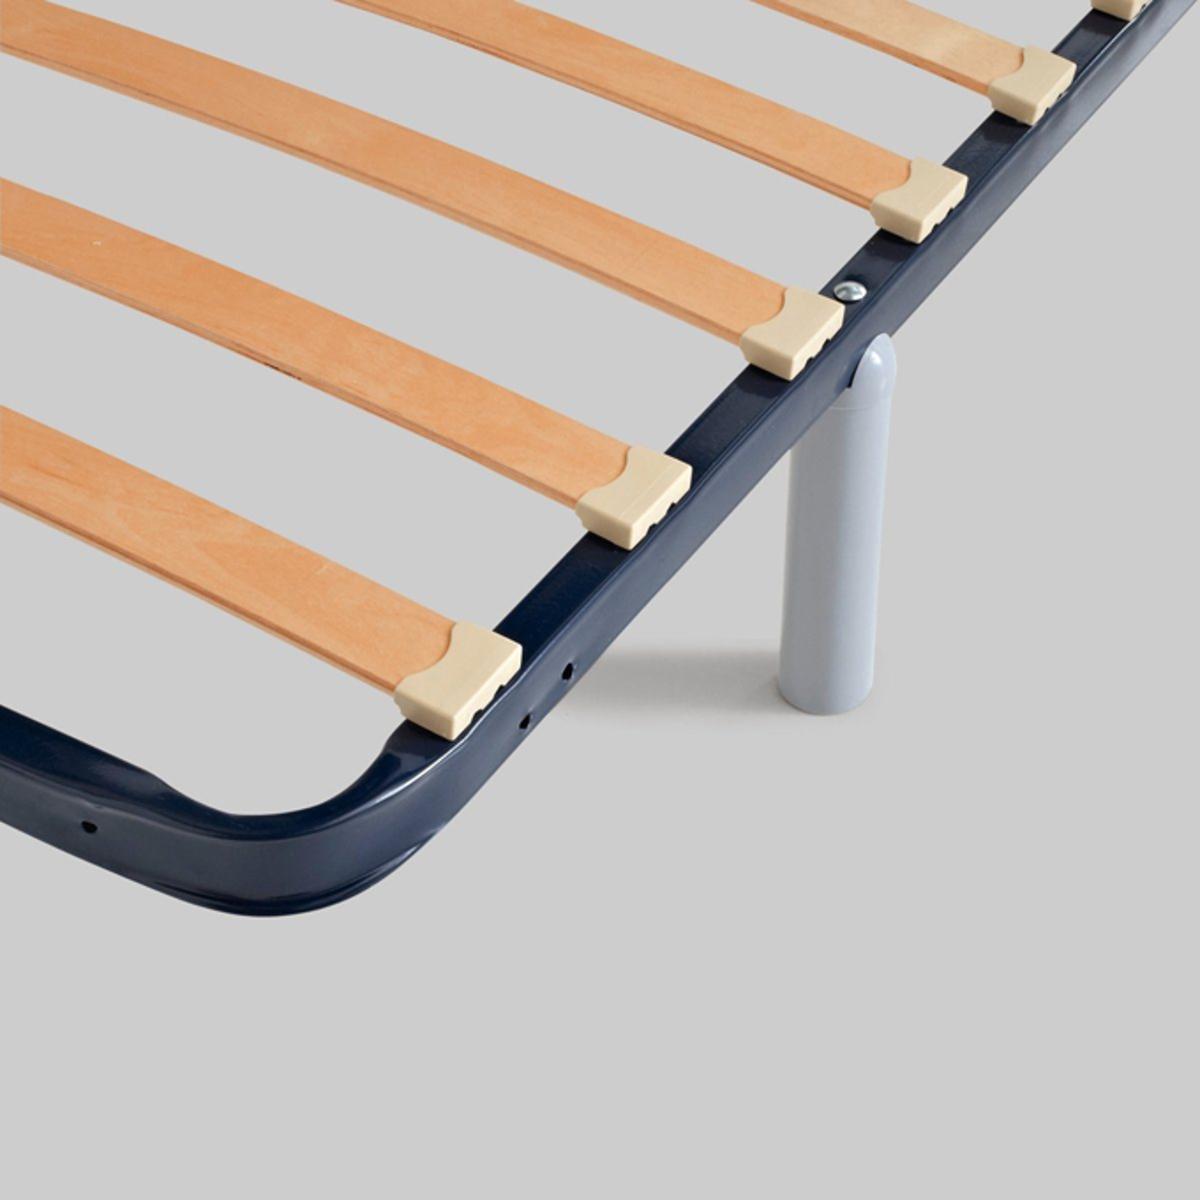 4 ножки для каркаса кроватиДля двойных основ под матрас заказывайте 2 набора из 4 ножек.<br><br>Цвет: серый